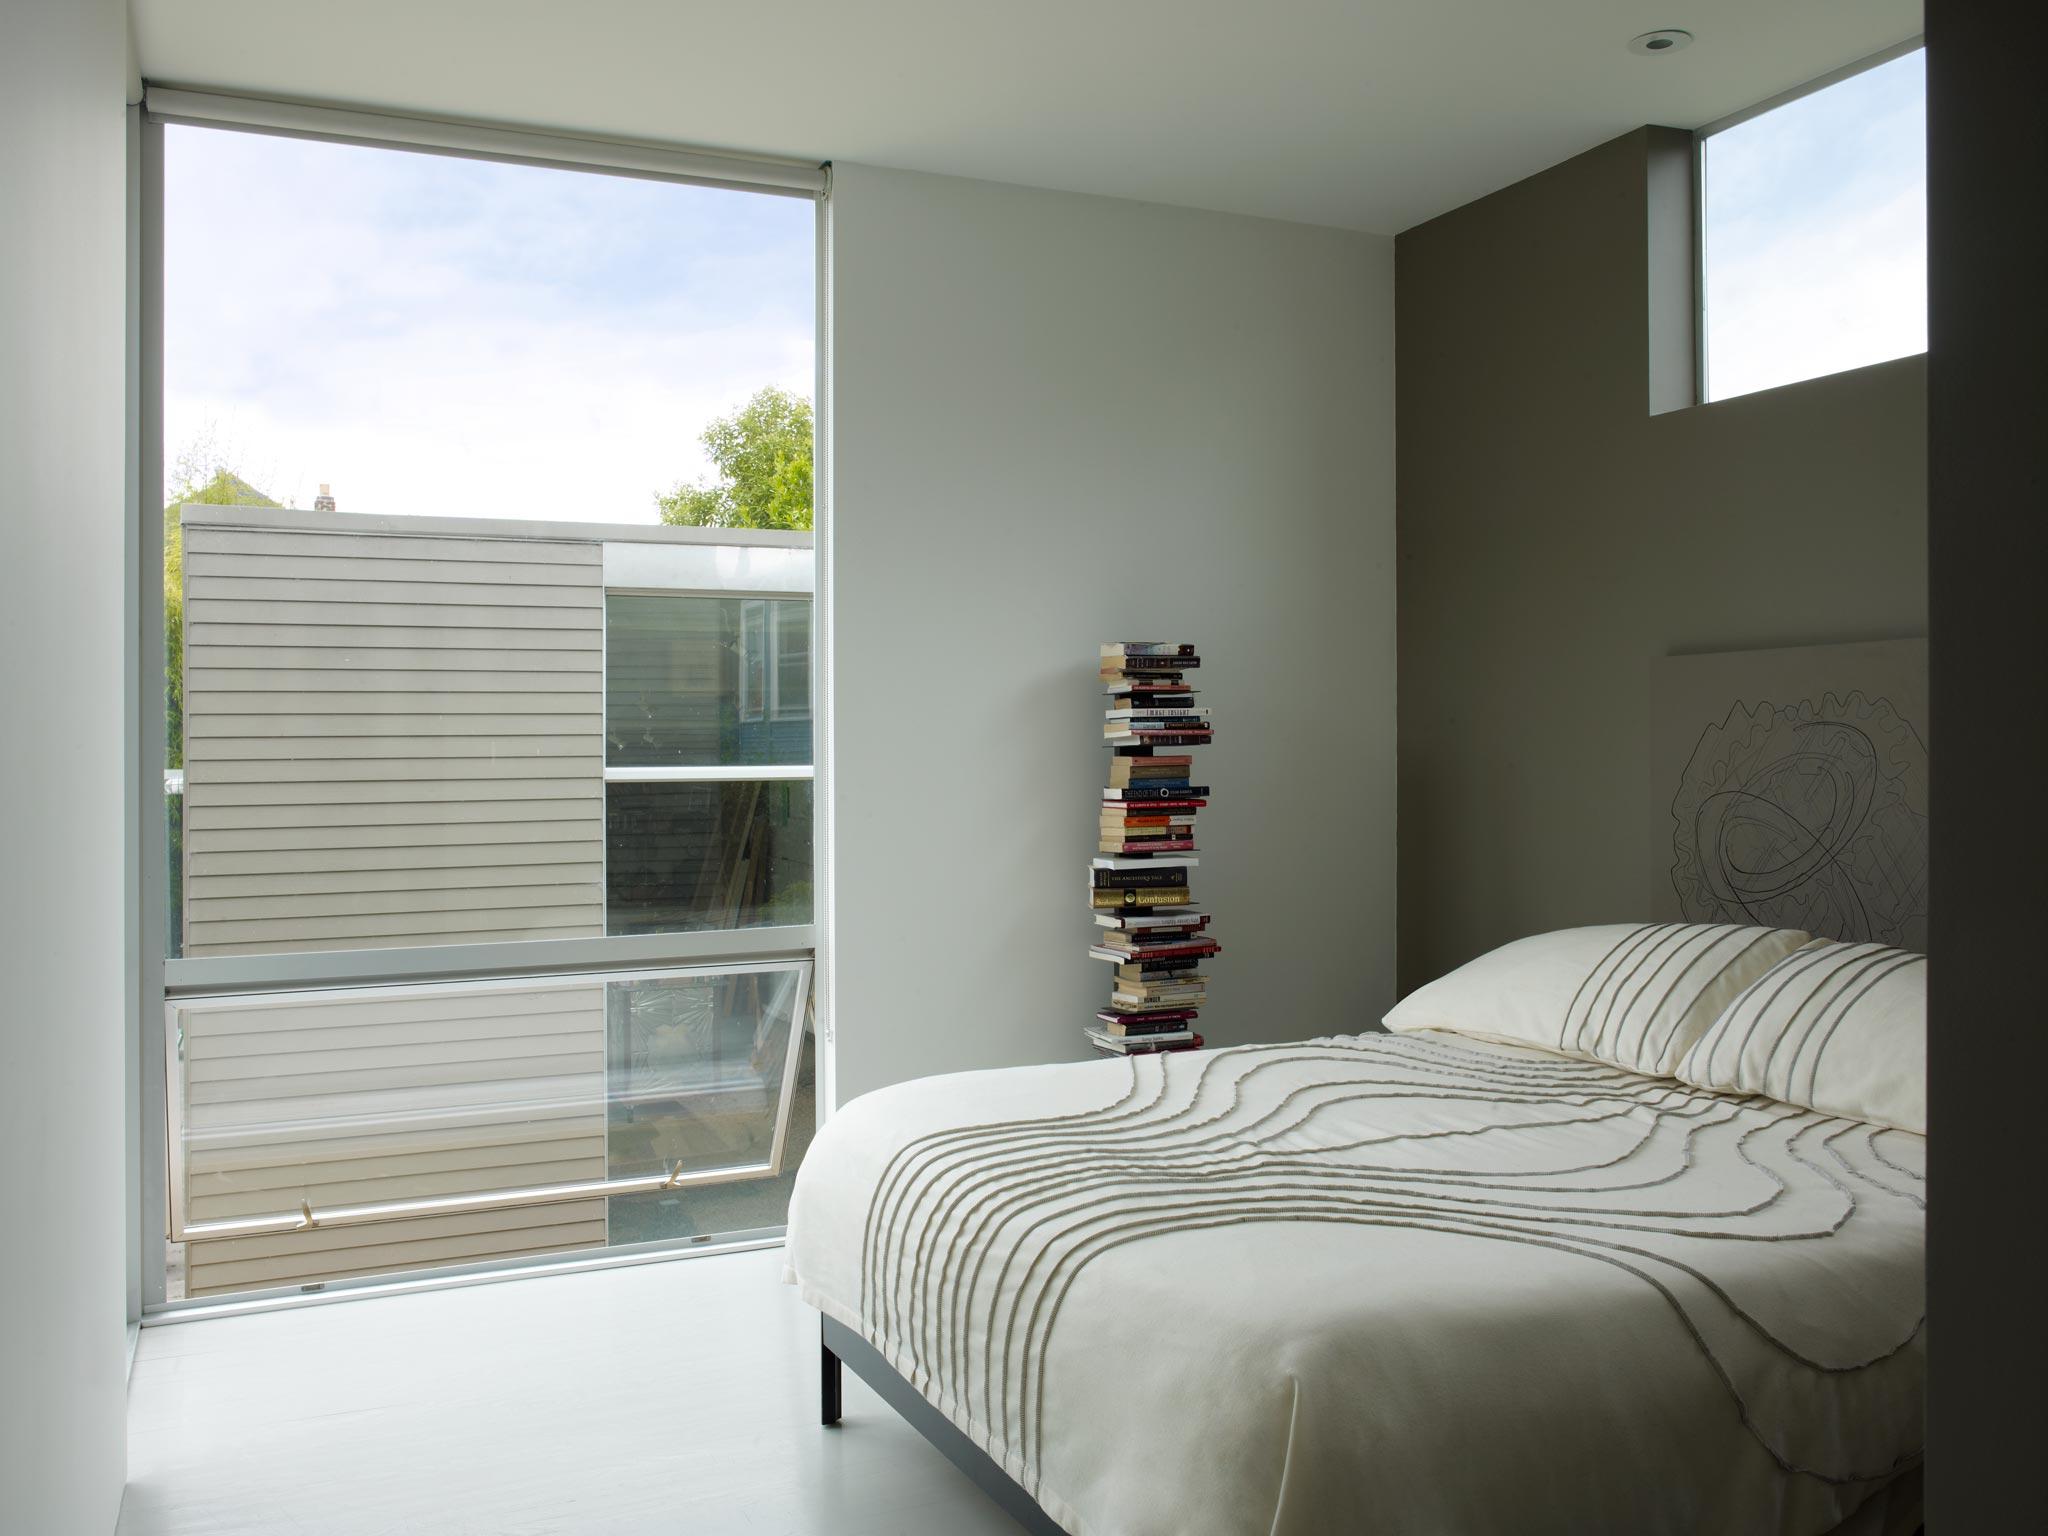 Oakland Urban modern master suite, roof deck and artist's studio interior view of bedroom